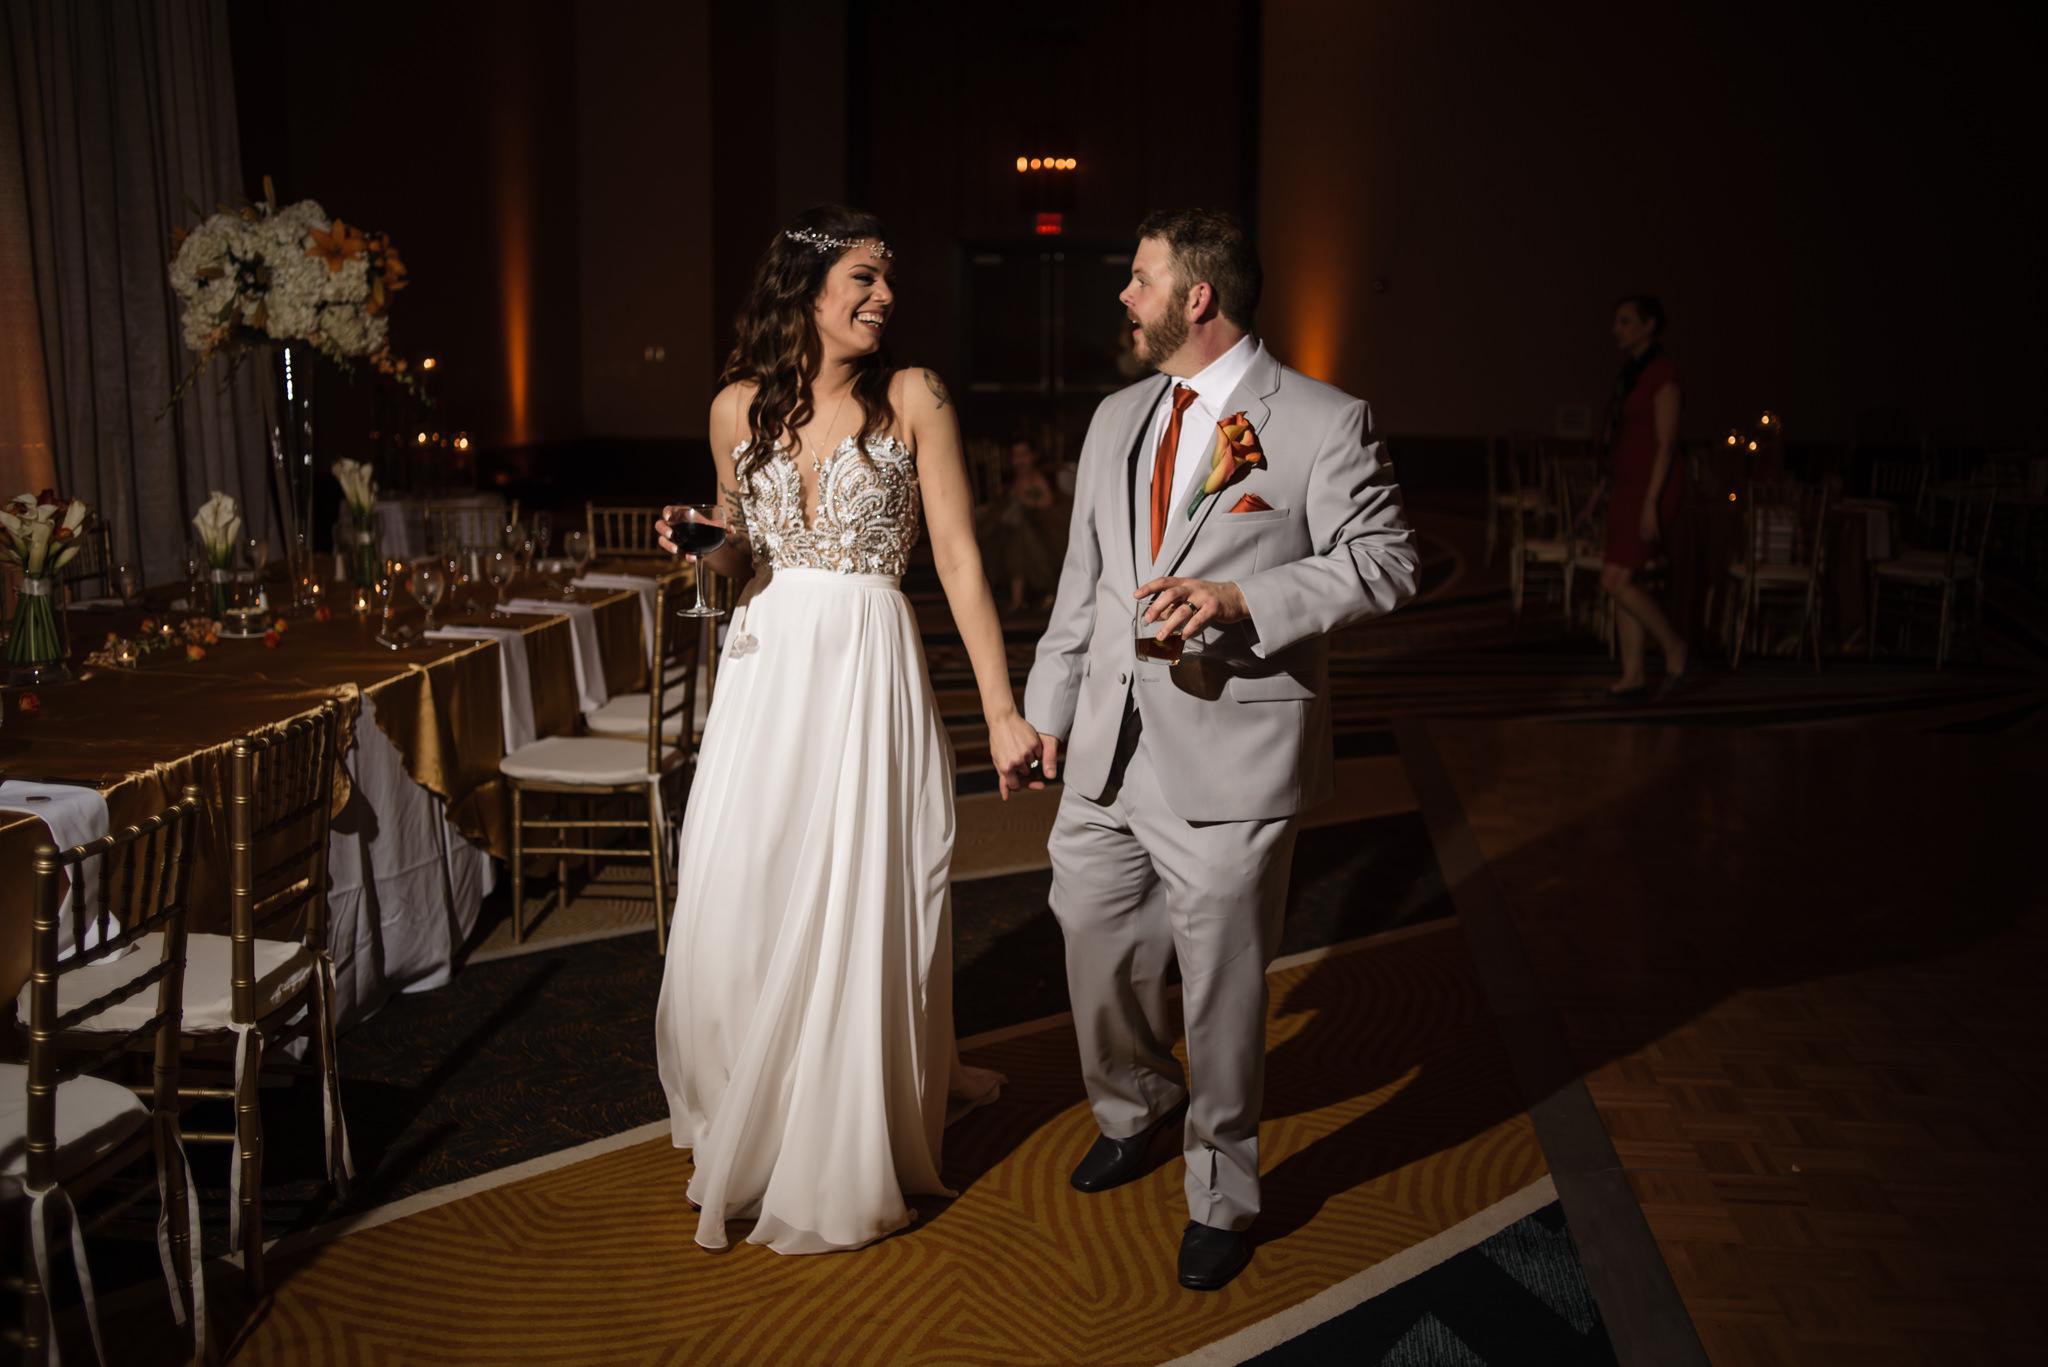 HILTON-OMAHA-WEDDING-PHOTOGRAPHER-JM-STUDIOS-OMAHA-LIV-BRICE-032.jpg